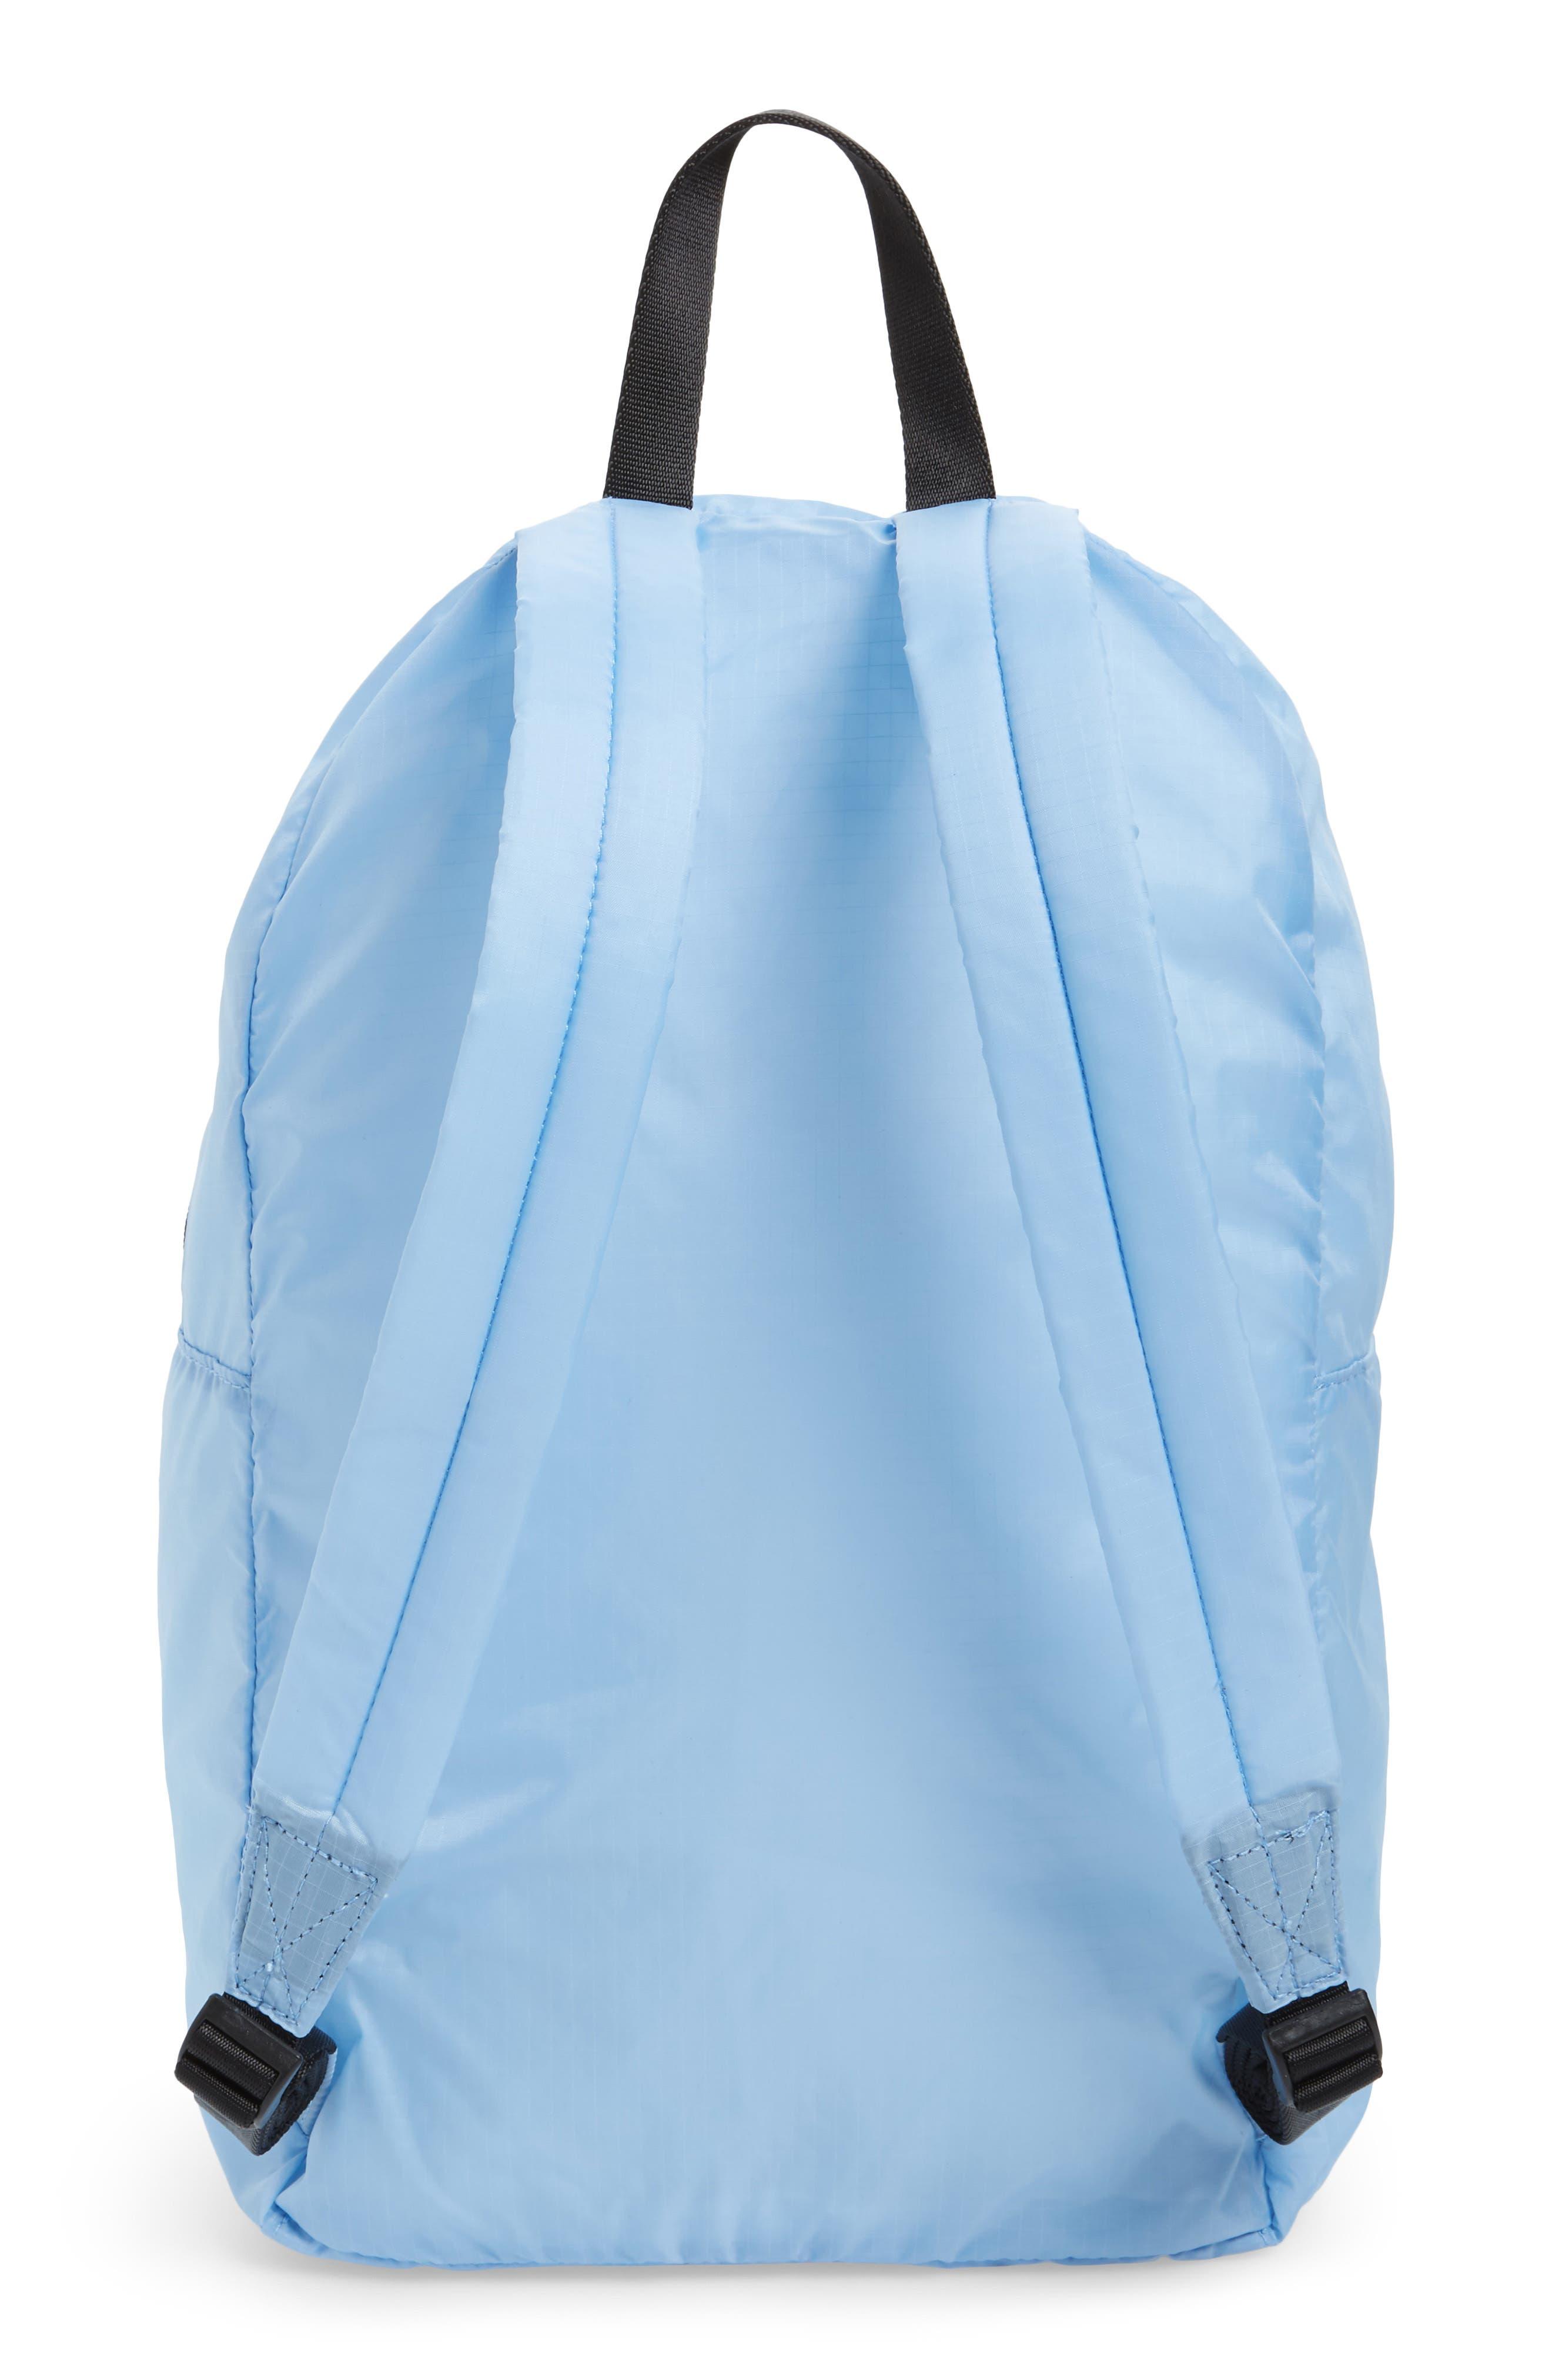 Ripstop Nylon Backpack,                             Alternate thumbnail 11, color,